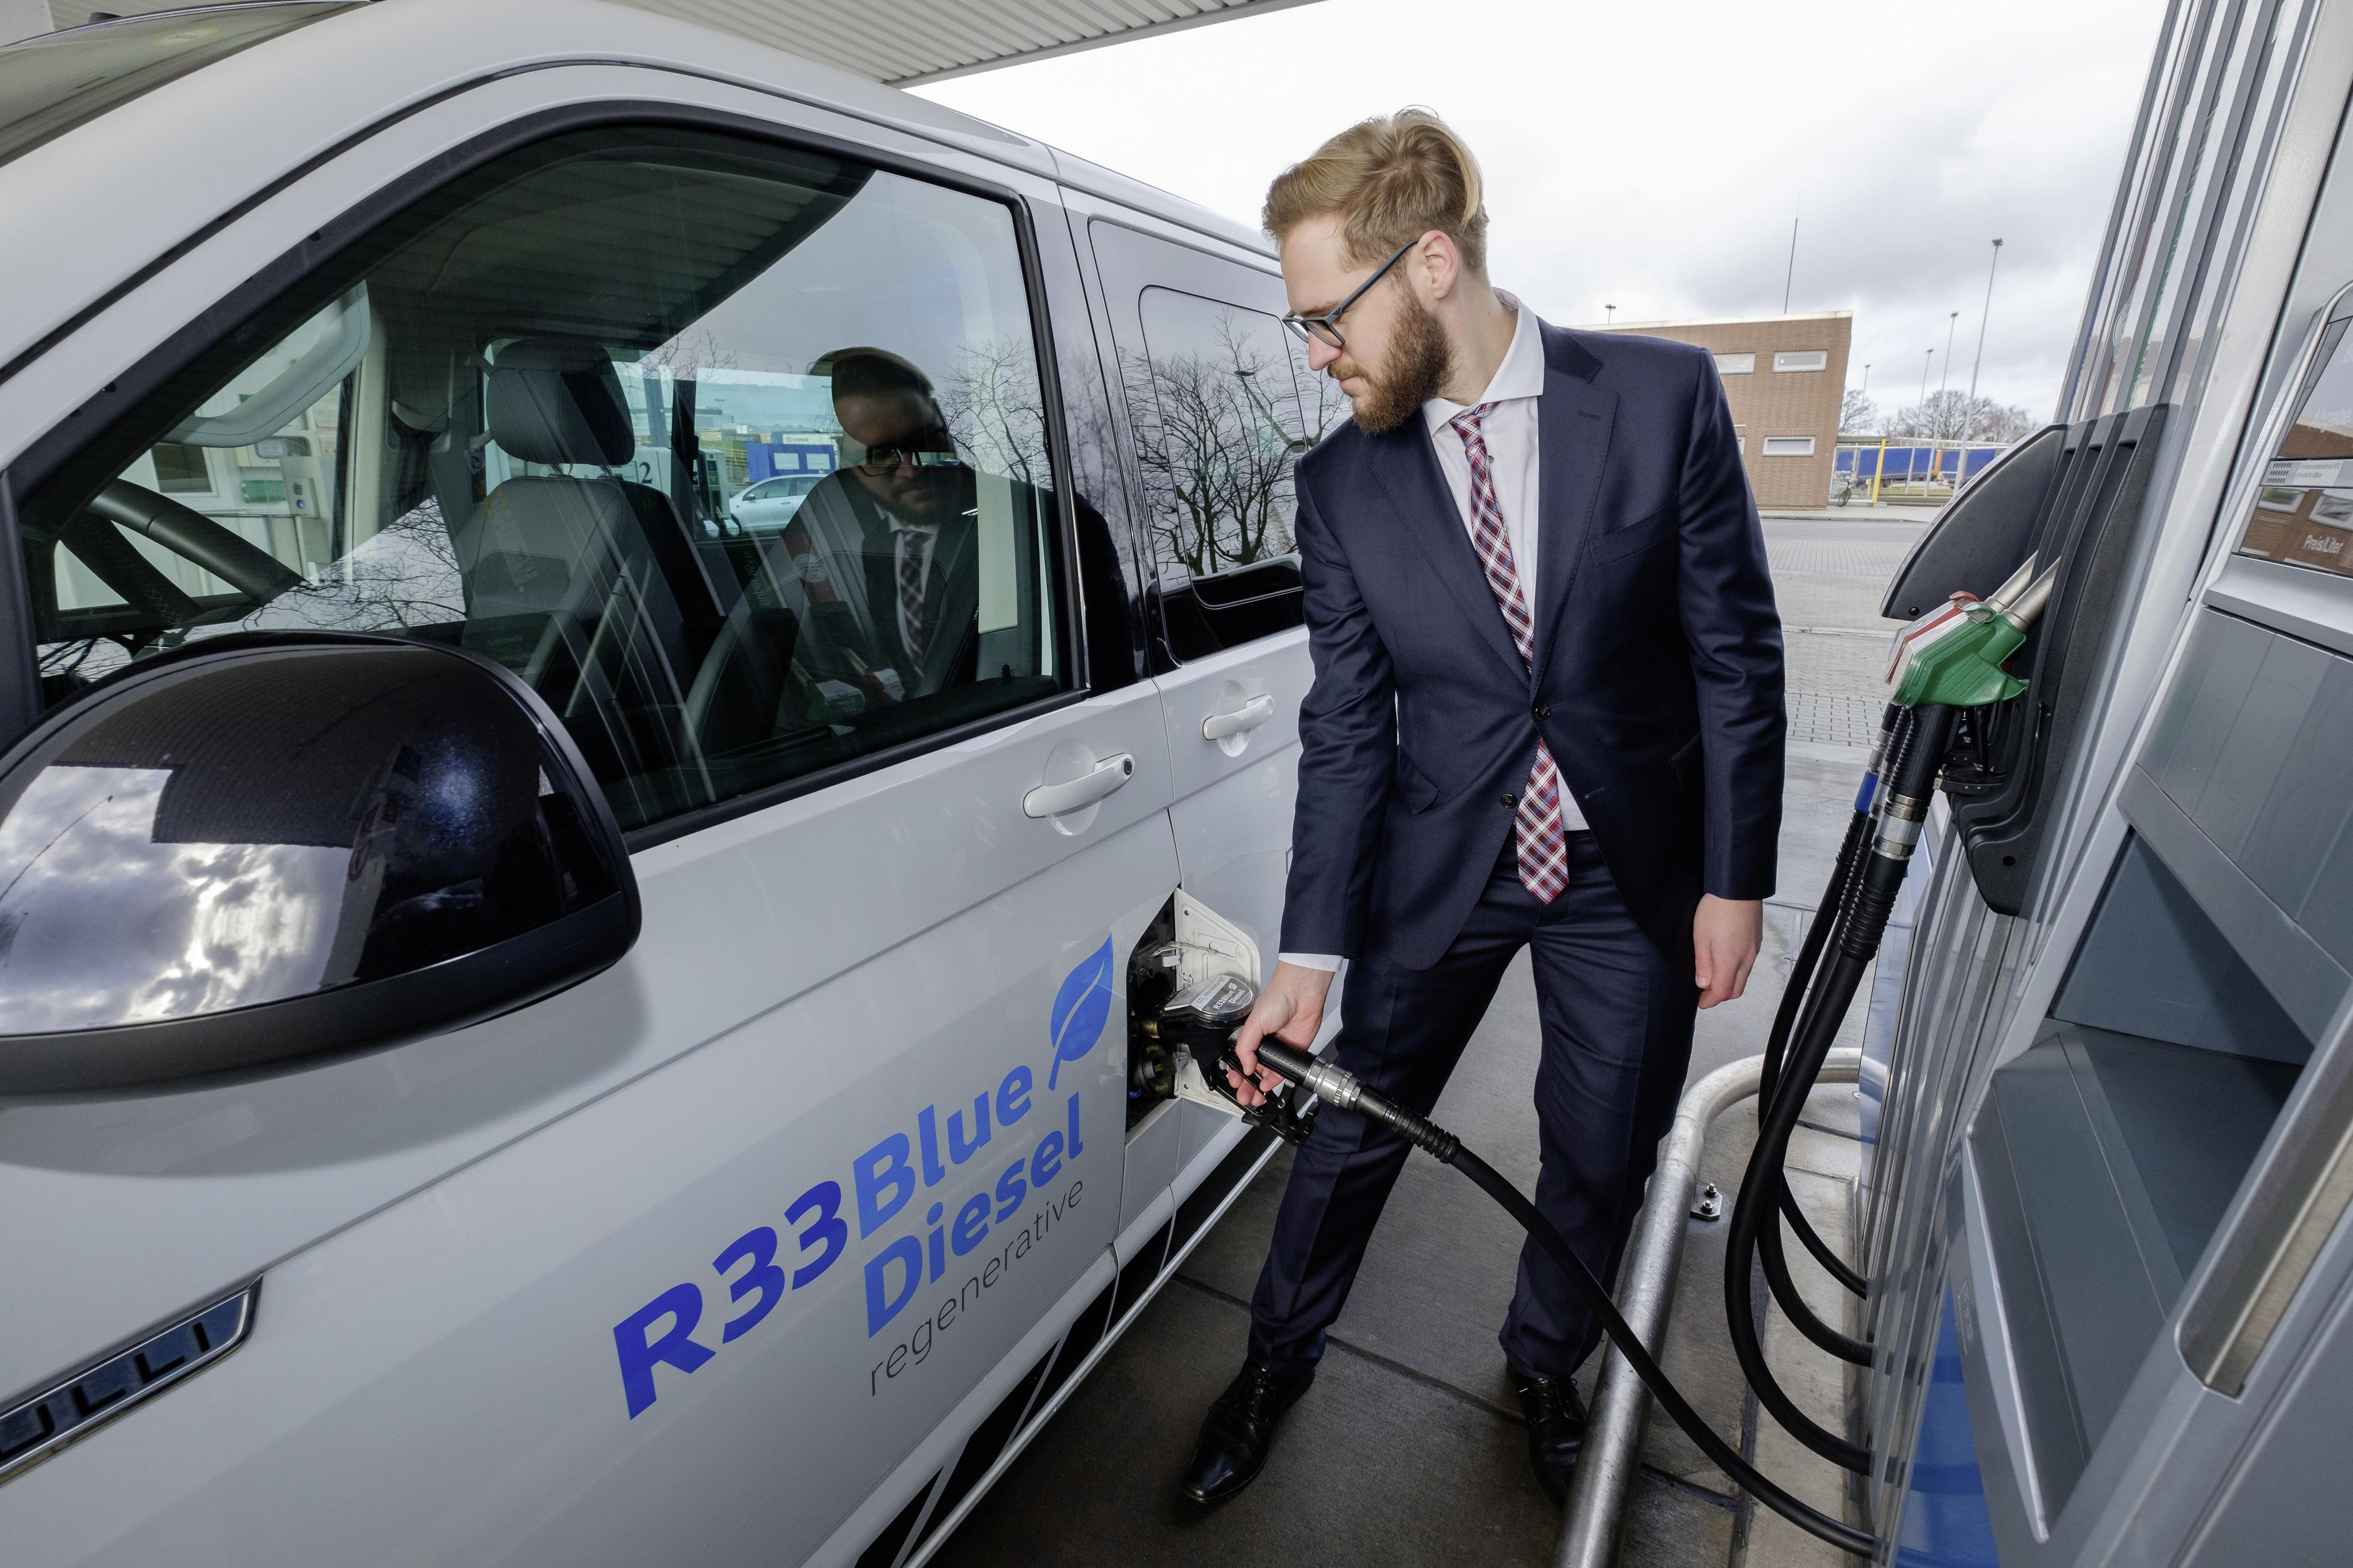 VW testował nowe paliwo R33 BlueDiesel